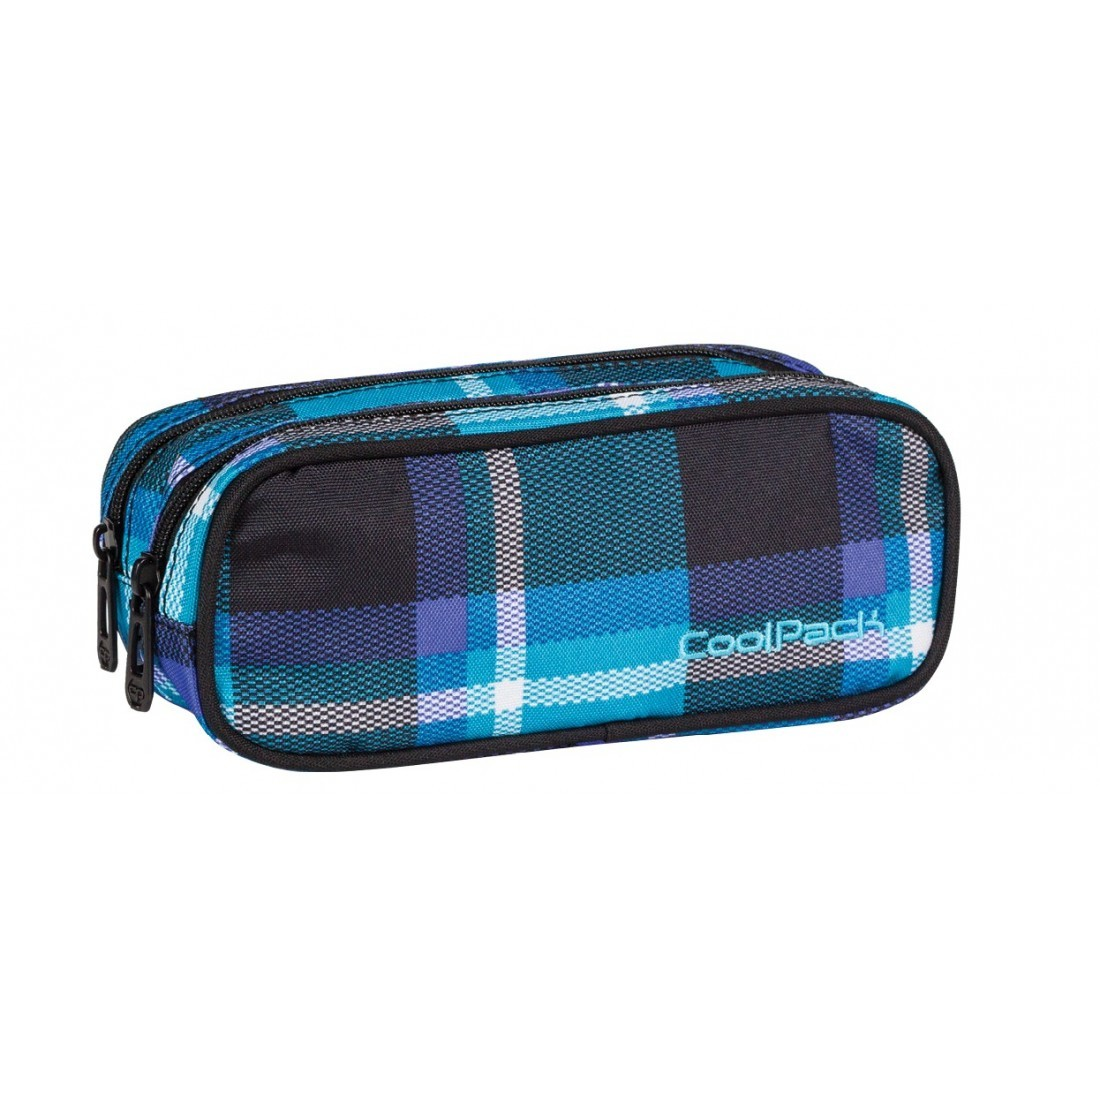 Saszetka podwójna CoolPack CLEVER SCOTT CP 387 - plecak-tornister.pl